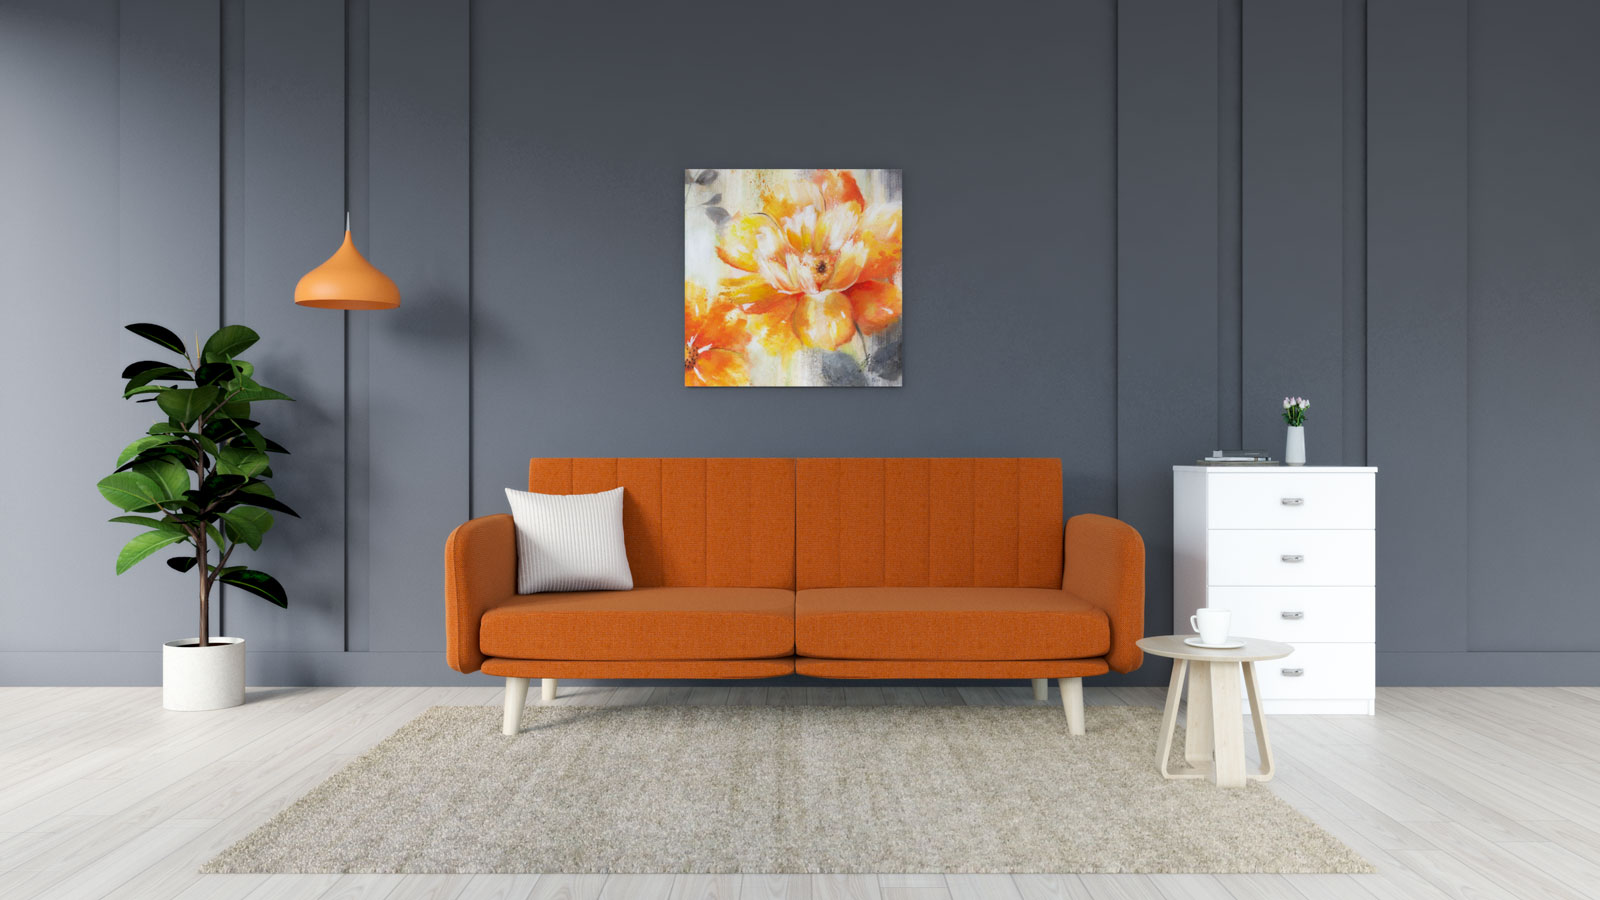 Beige rug with orange couch